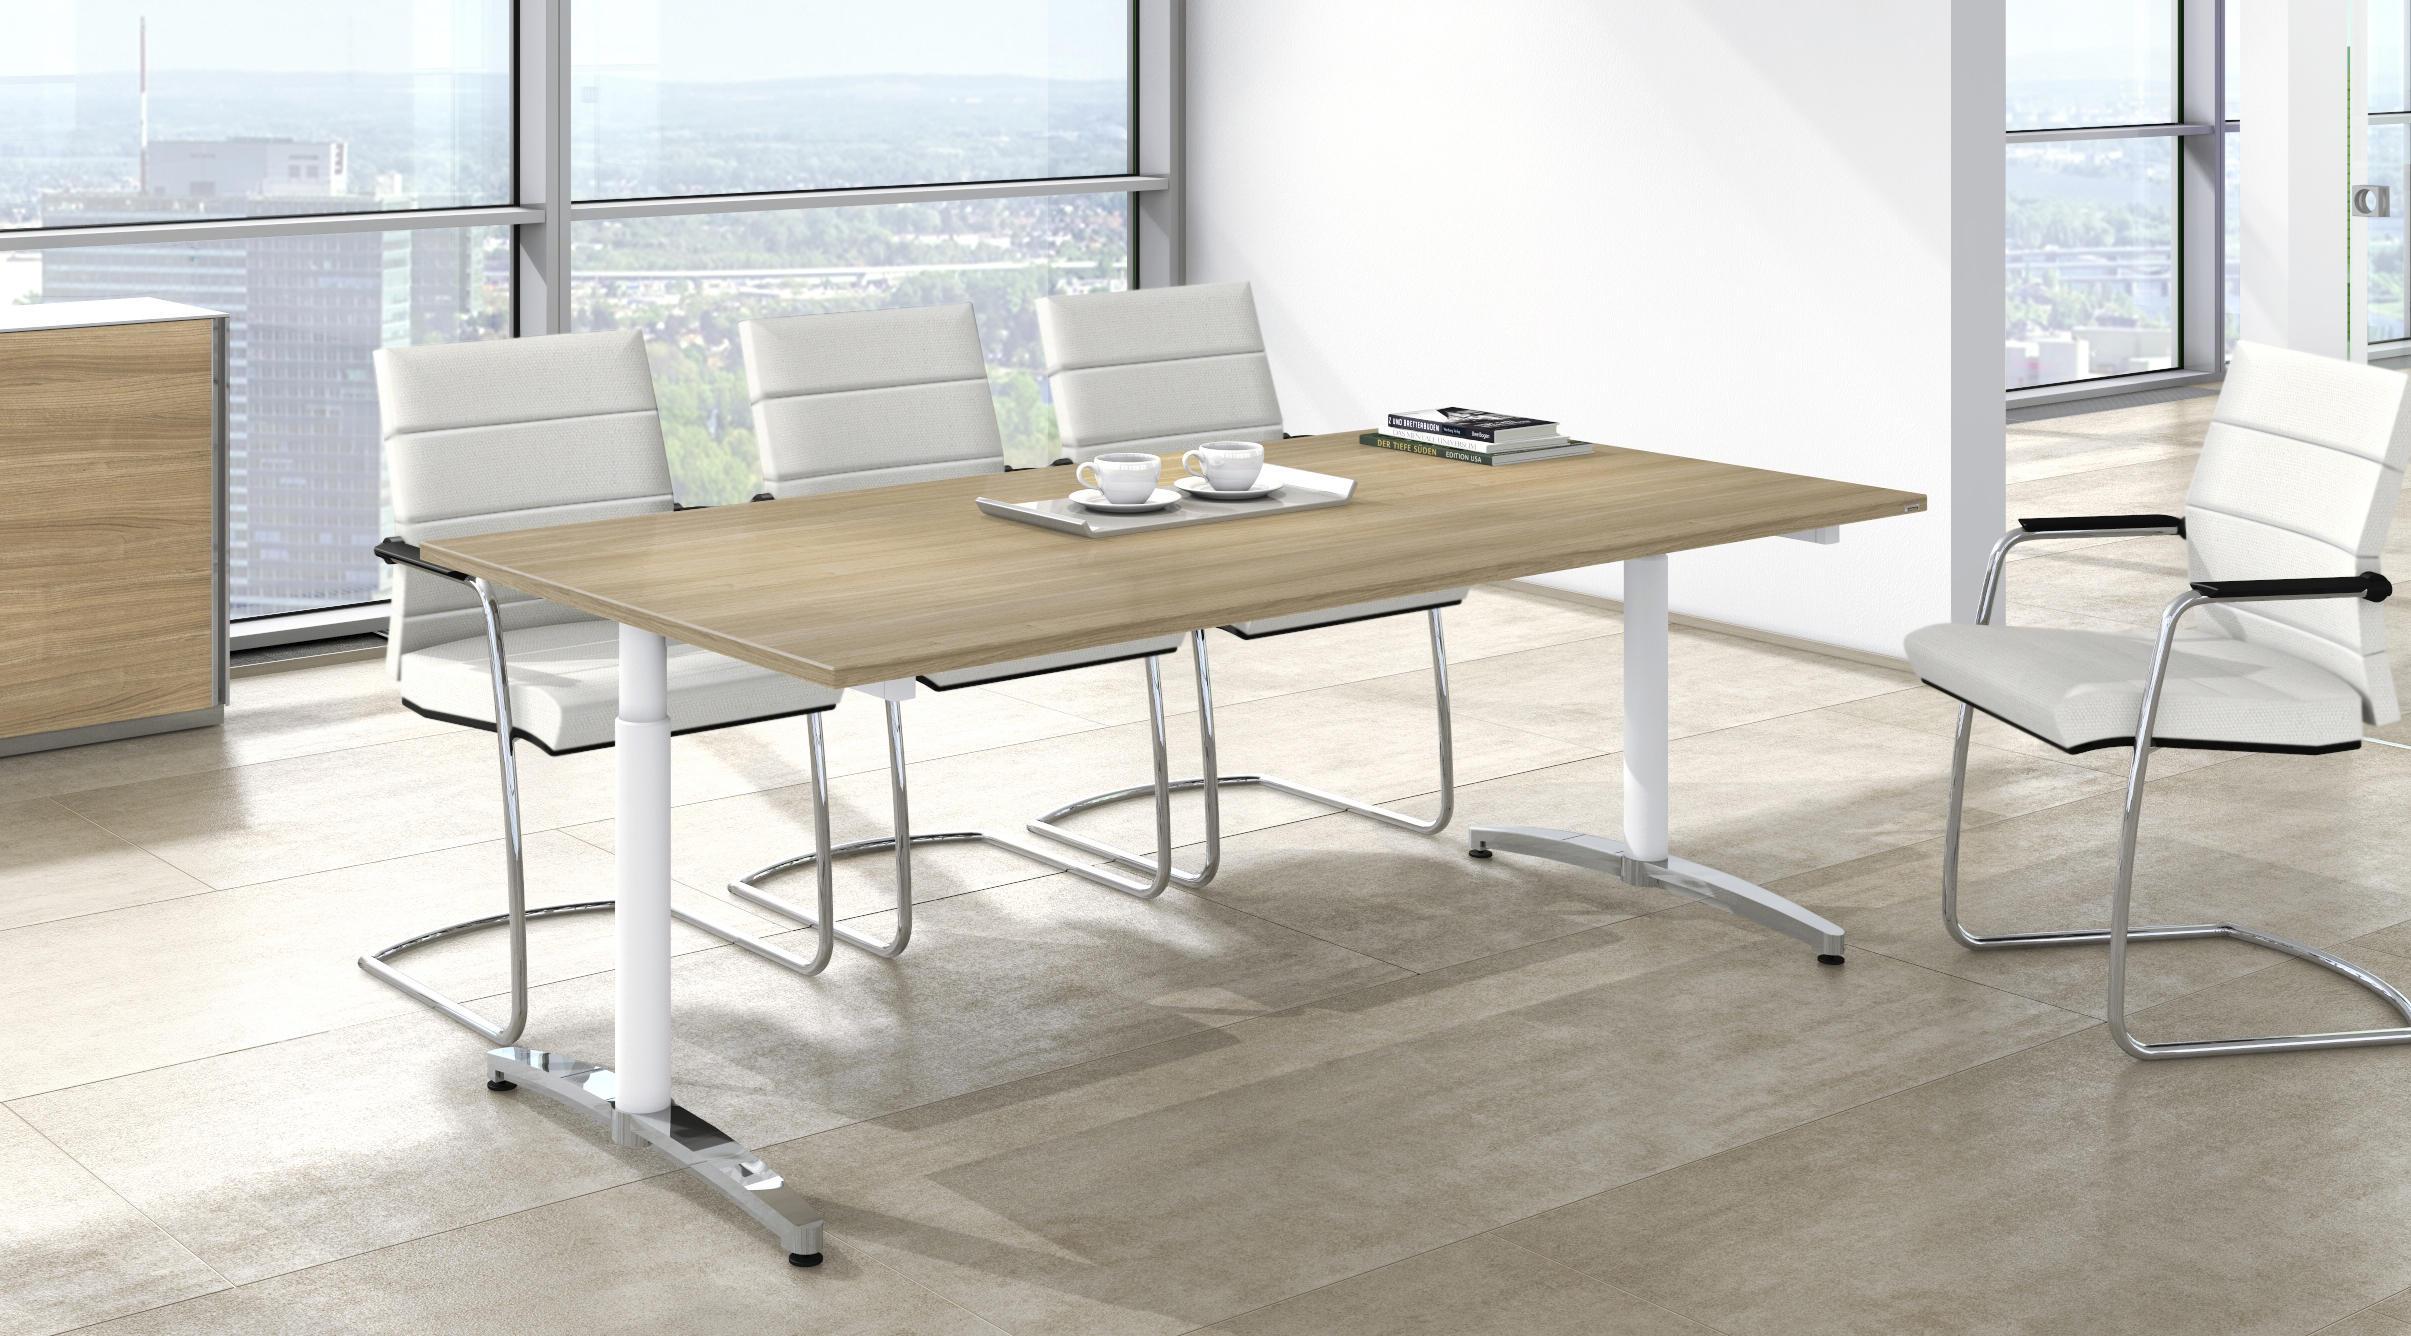 canvaro meeting tables de conf rence de assmann. Black Bedroom Furniture Sets. Home Design Ideas